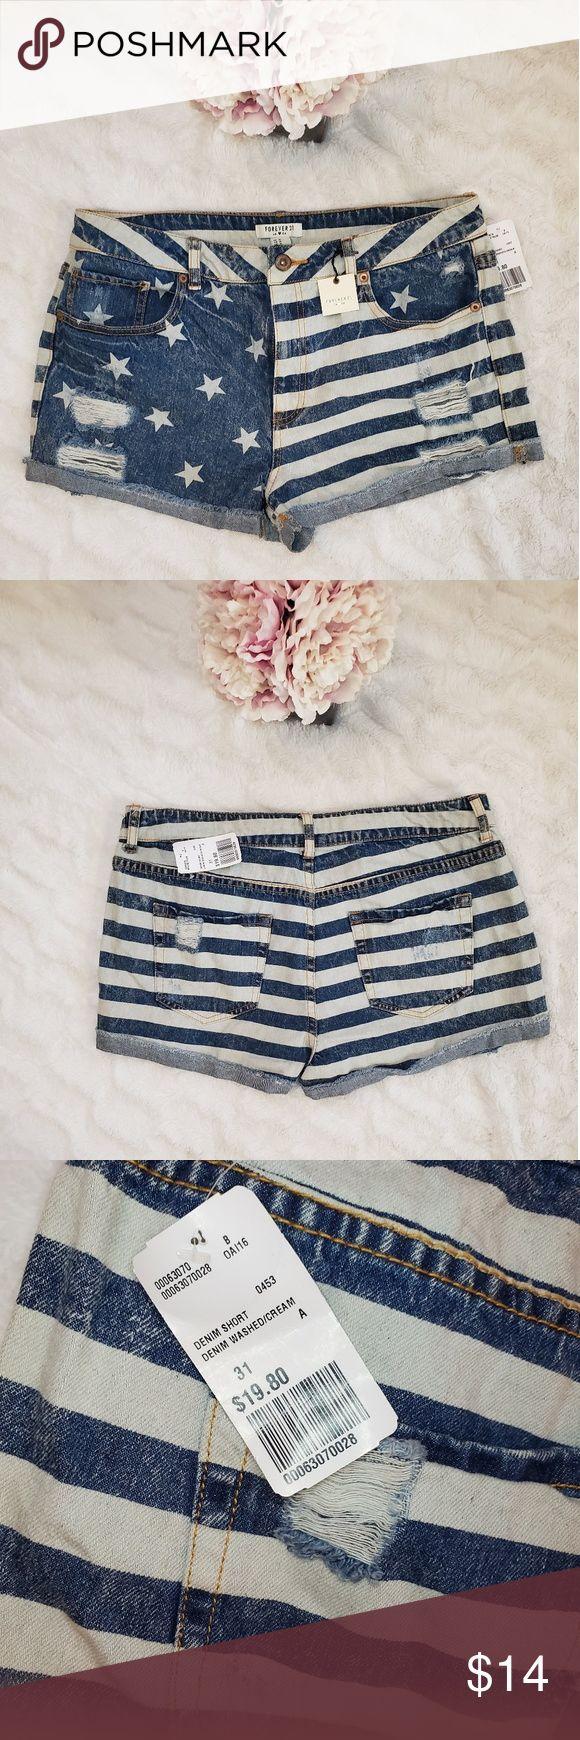 Stars and Stripes Jeansshorts Super süße NWT Stars and Stripes Jeansshorts. Pro…   – My Posh Picks